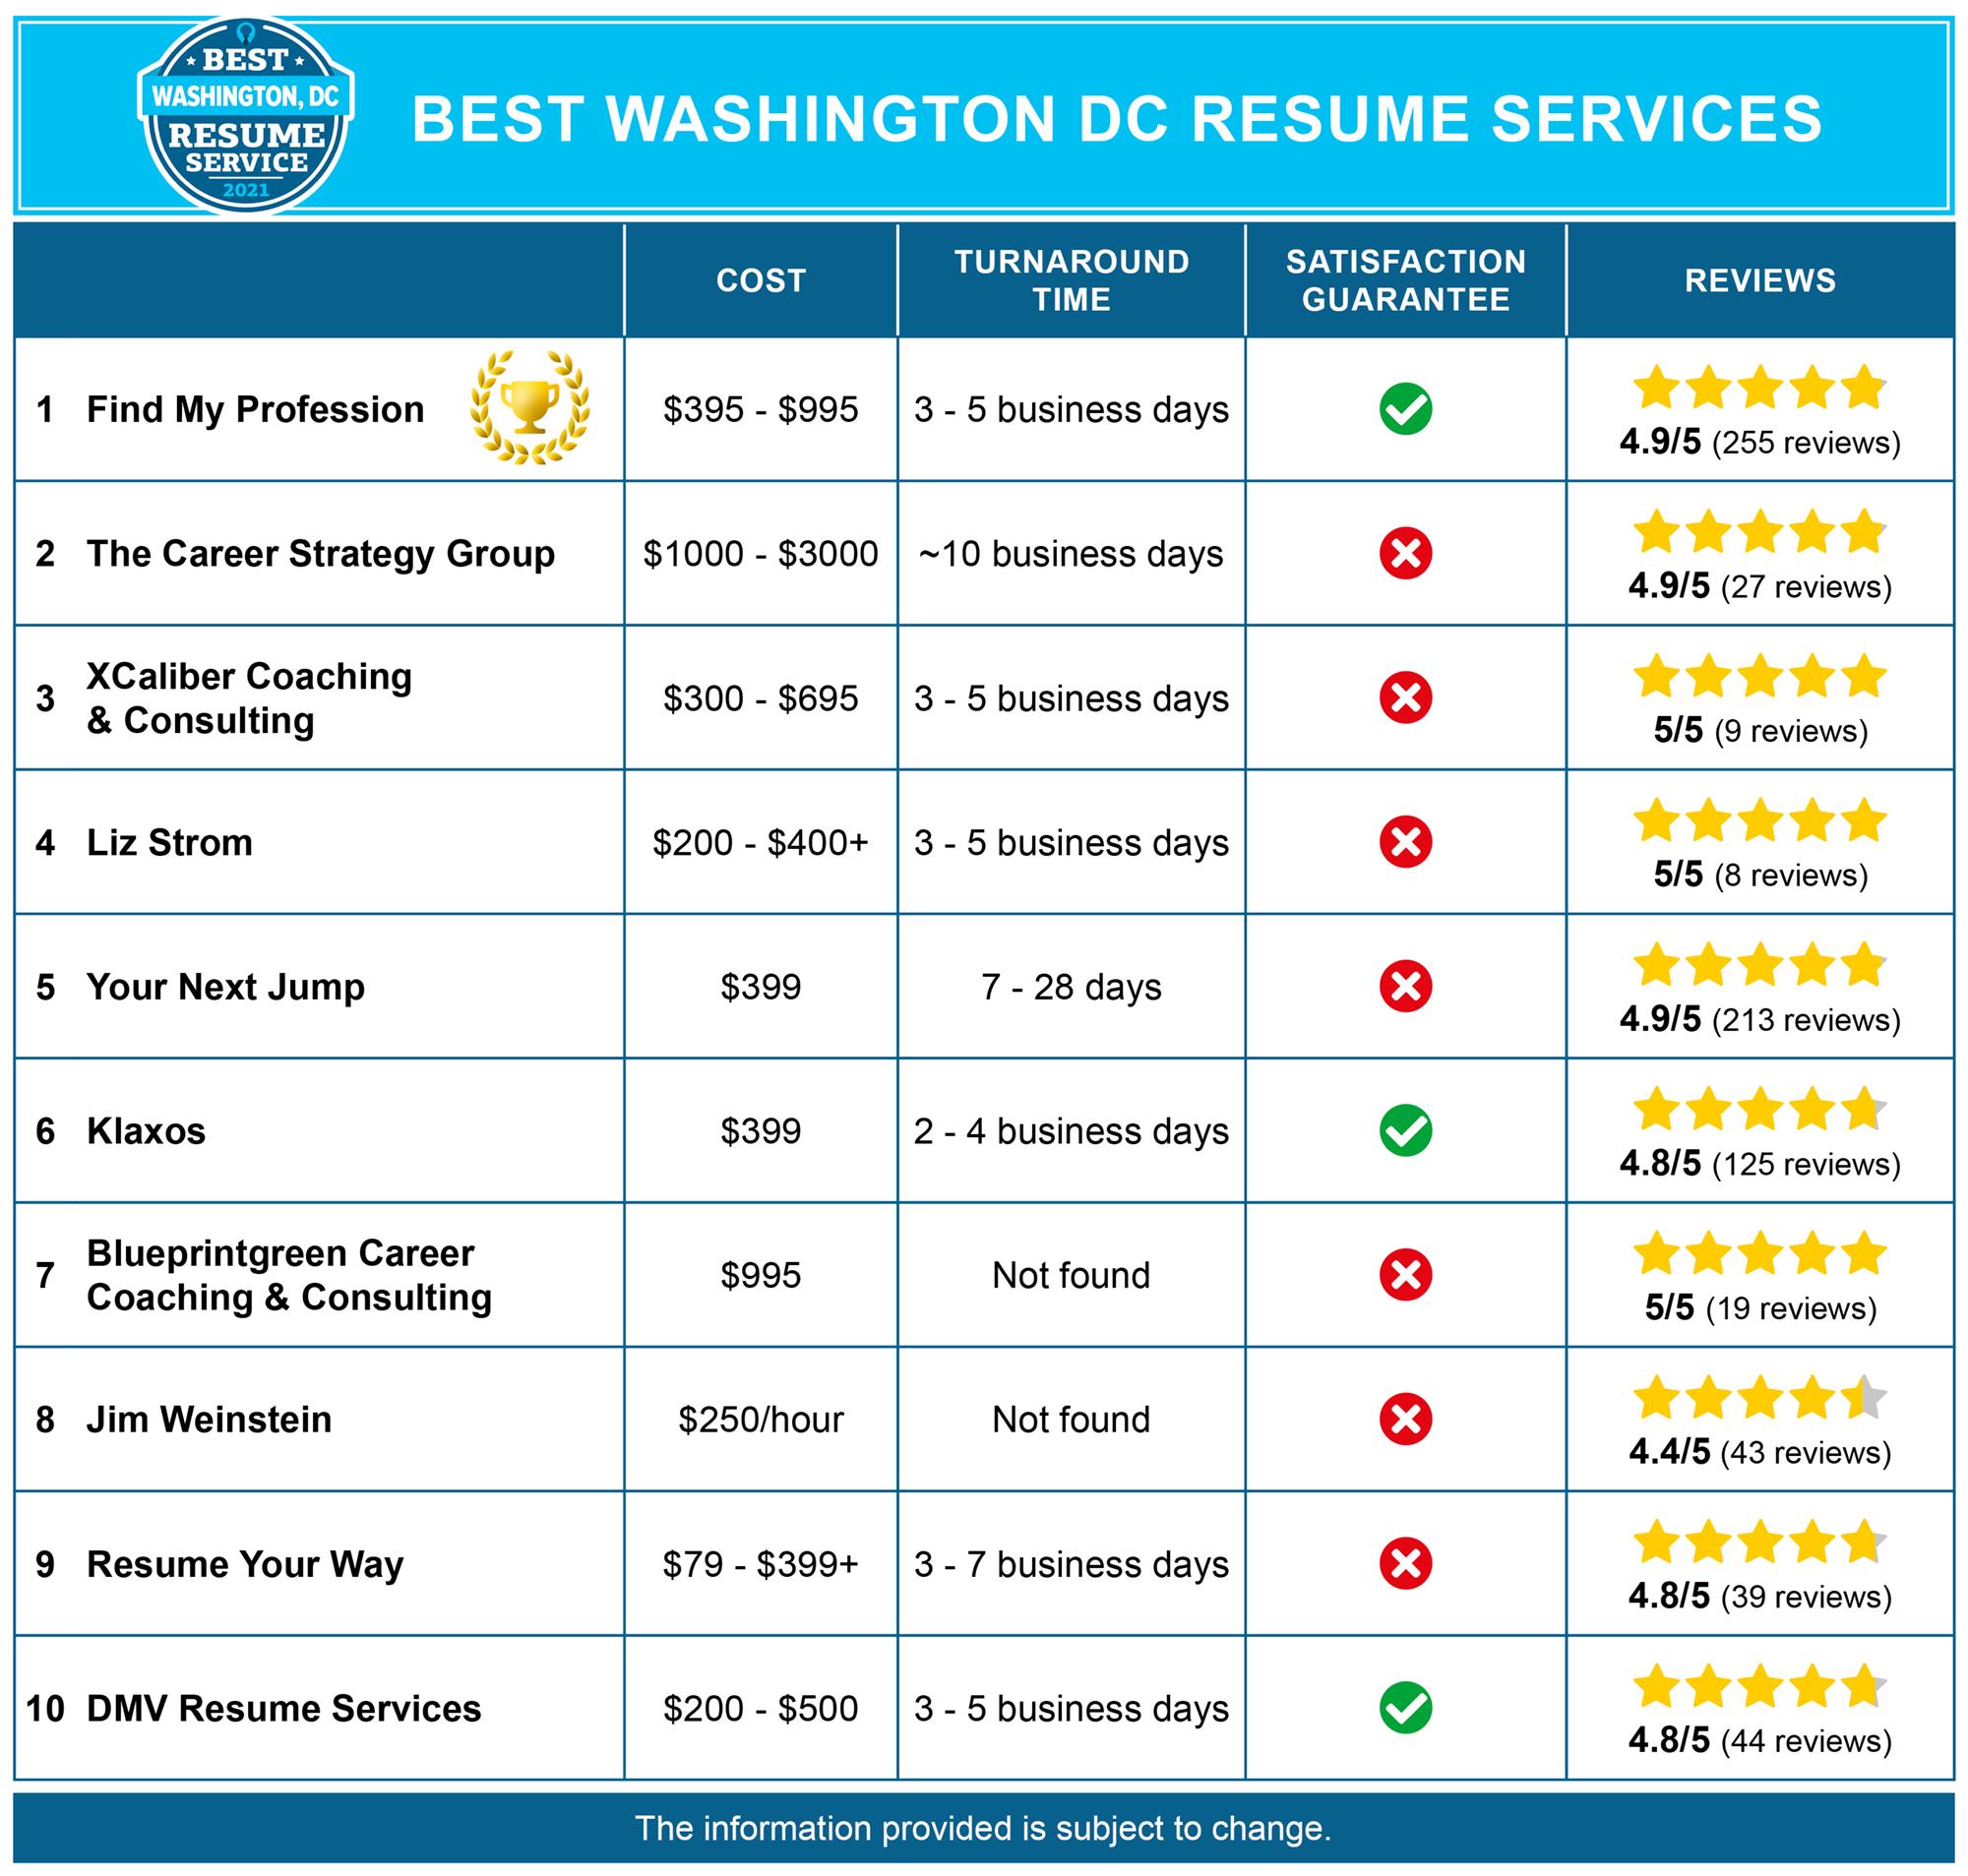 Best Washington DC Resume Services